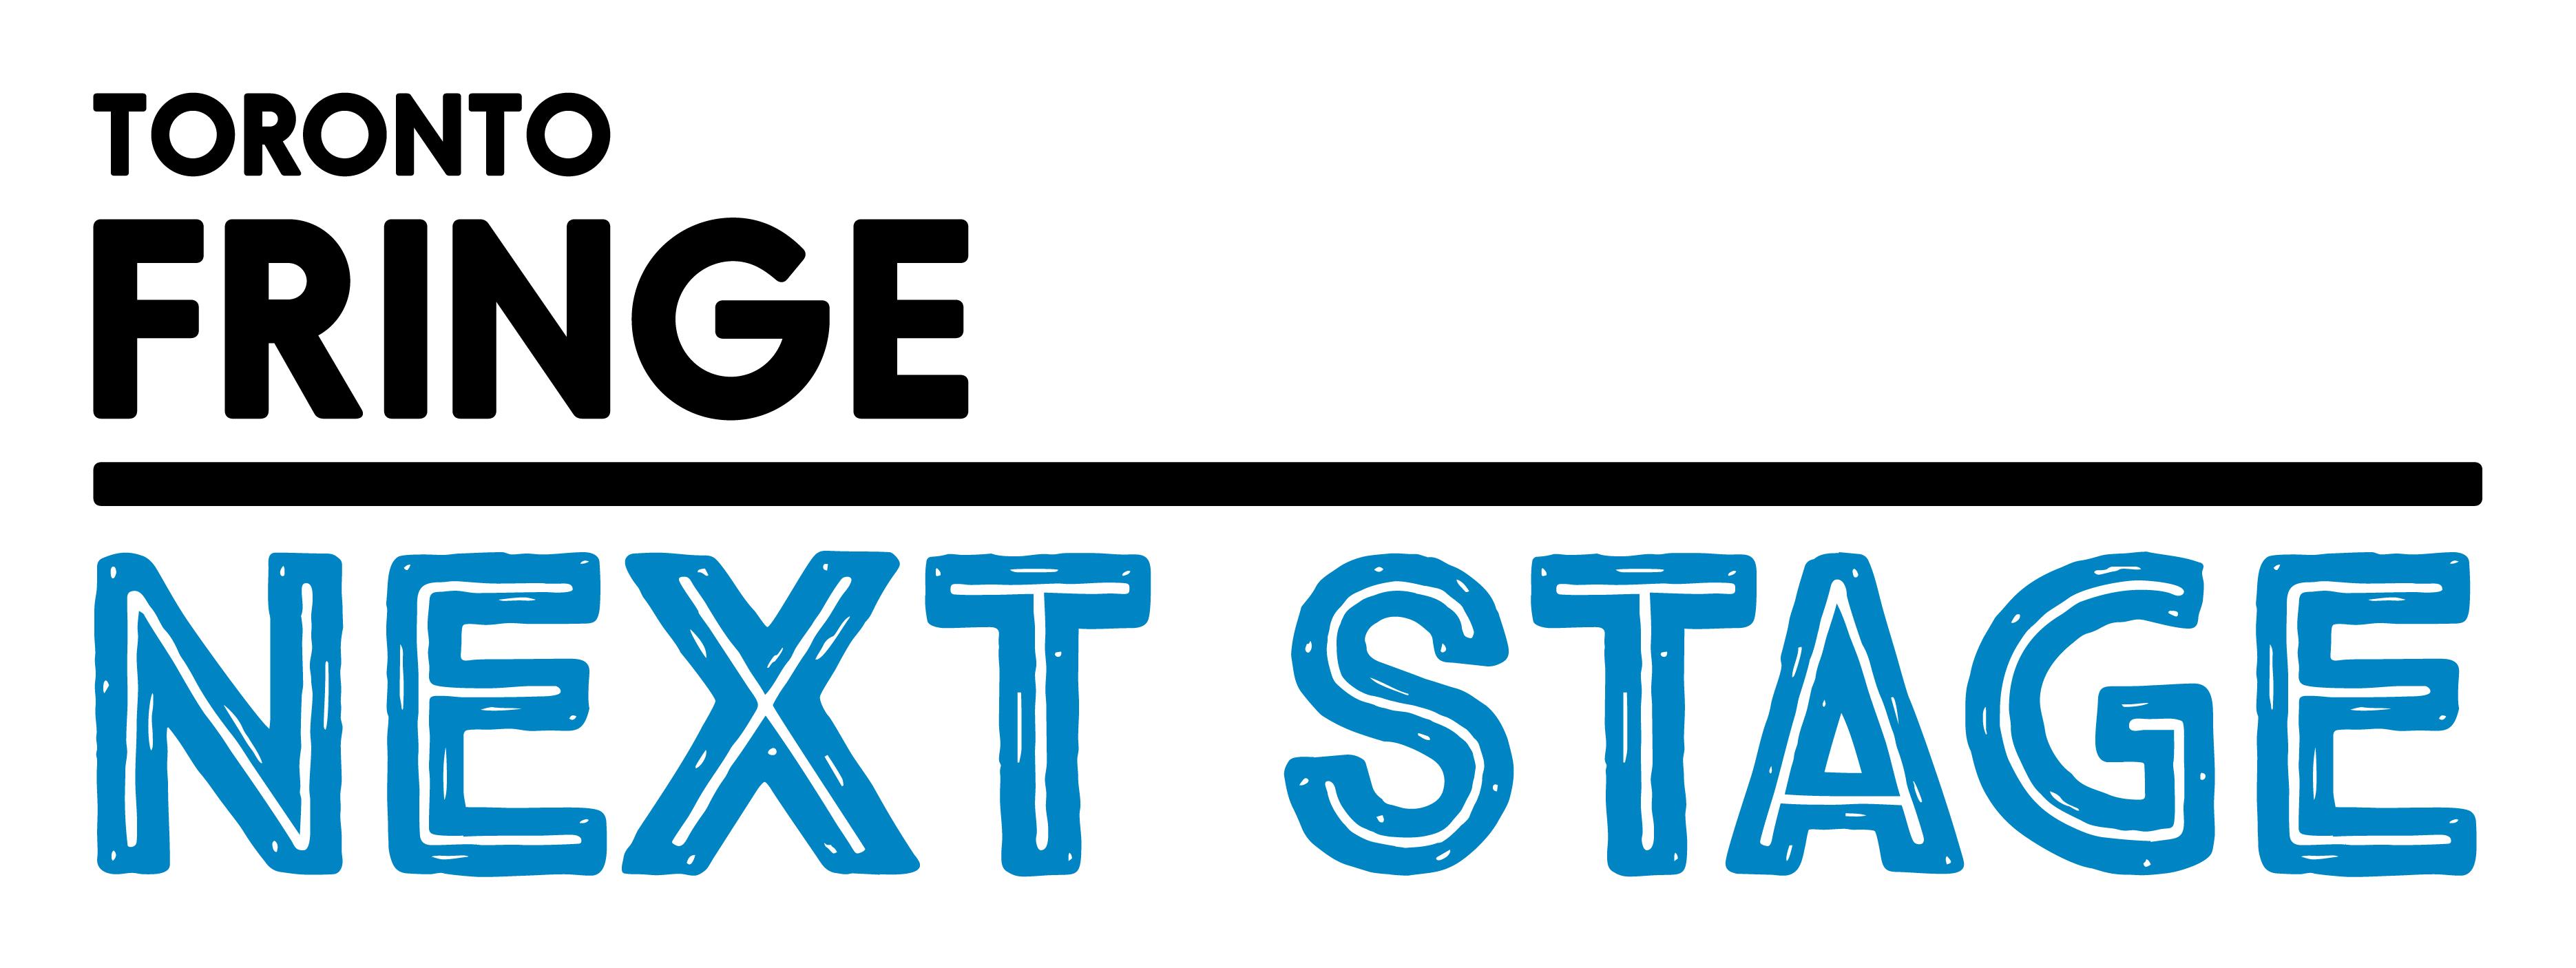 next stage logo